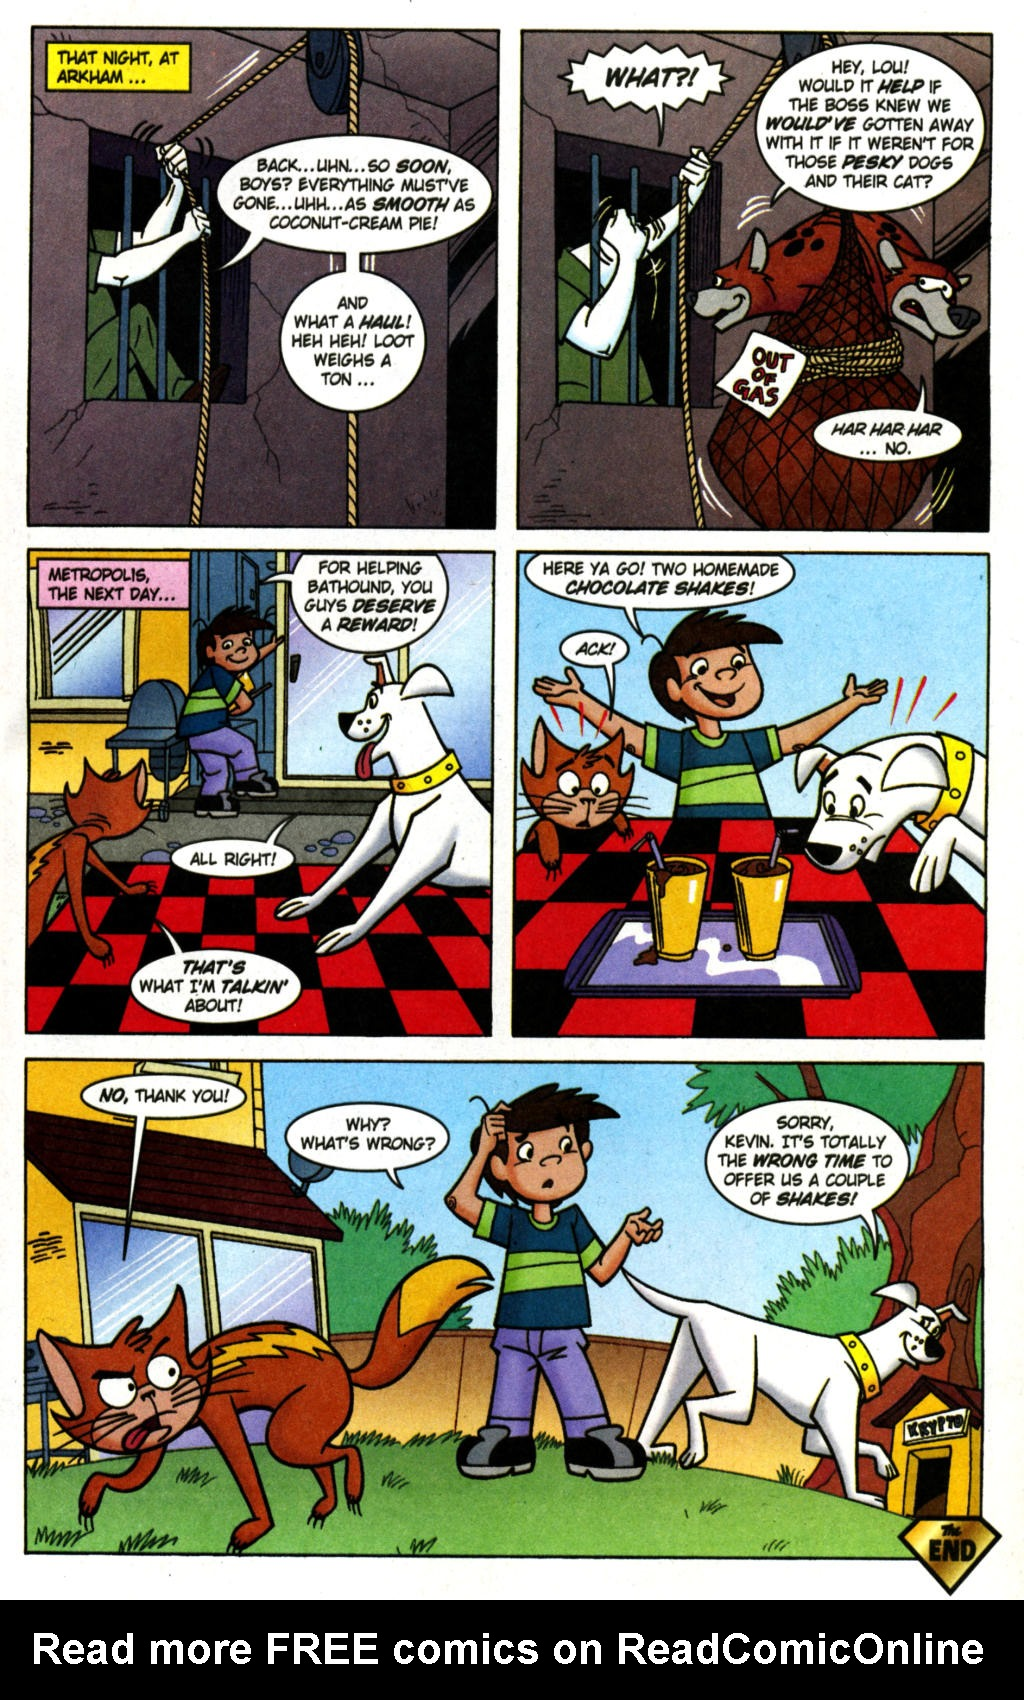 Read online Krypto the Superdog comic -  Issue #1 - 21